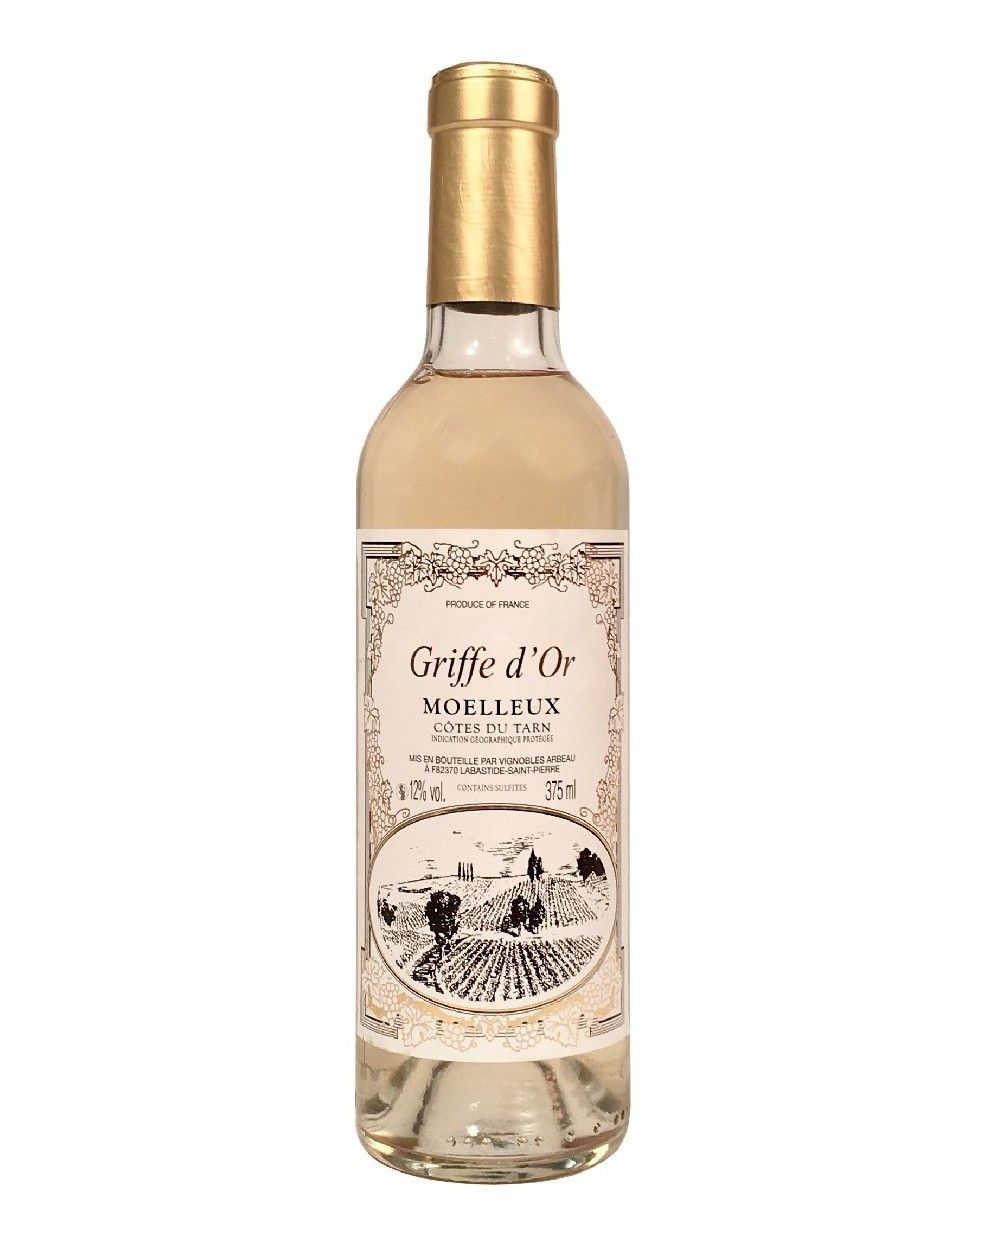 En commun Vin blanc moelleux Griffe d'or Côtes du Tarn - Halte Gourmande @YR_83